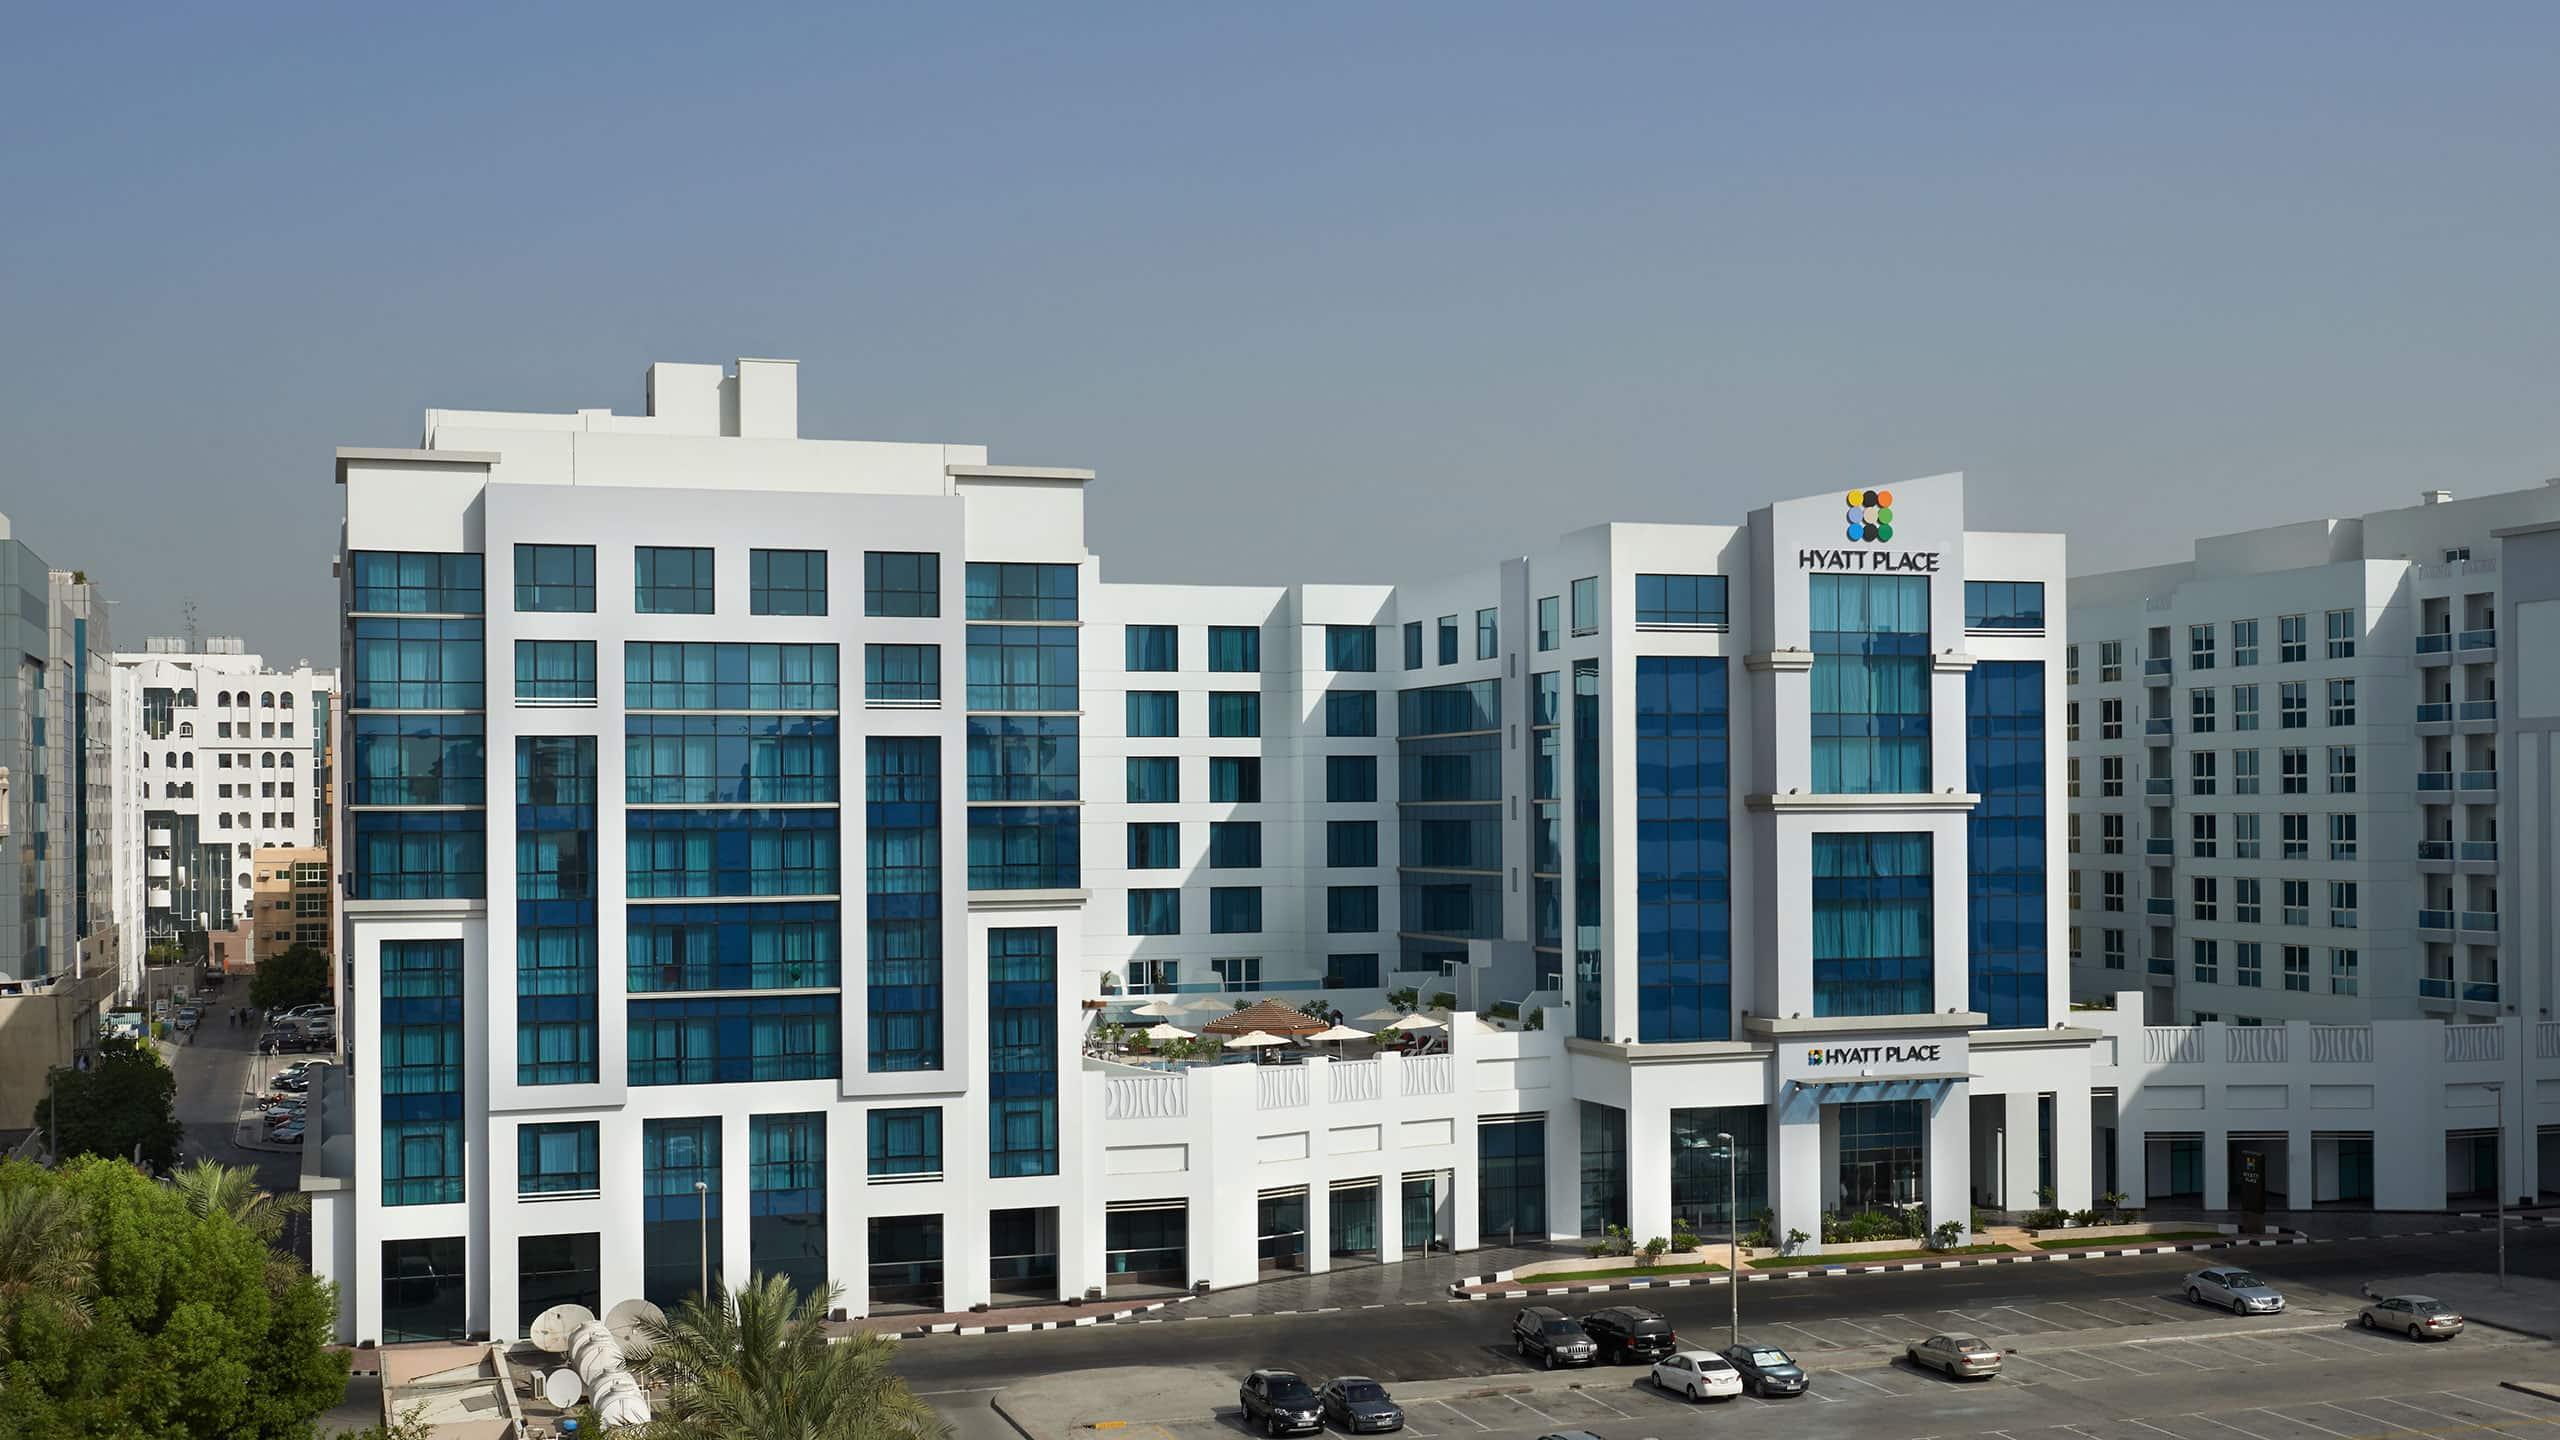 Modern 4 Star Hotel in Dubai | Hyatt Place Dubai Al Rigga